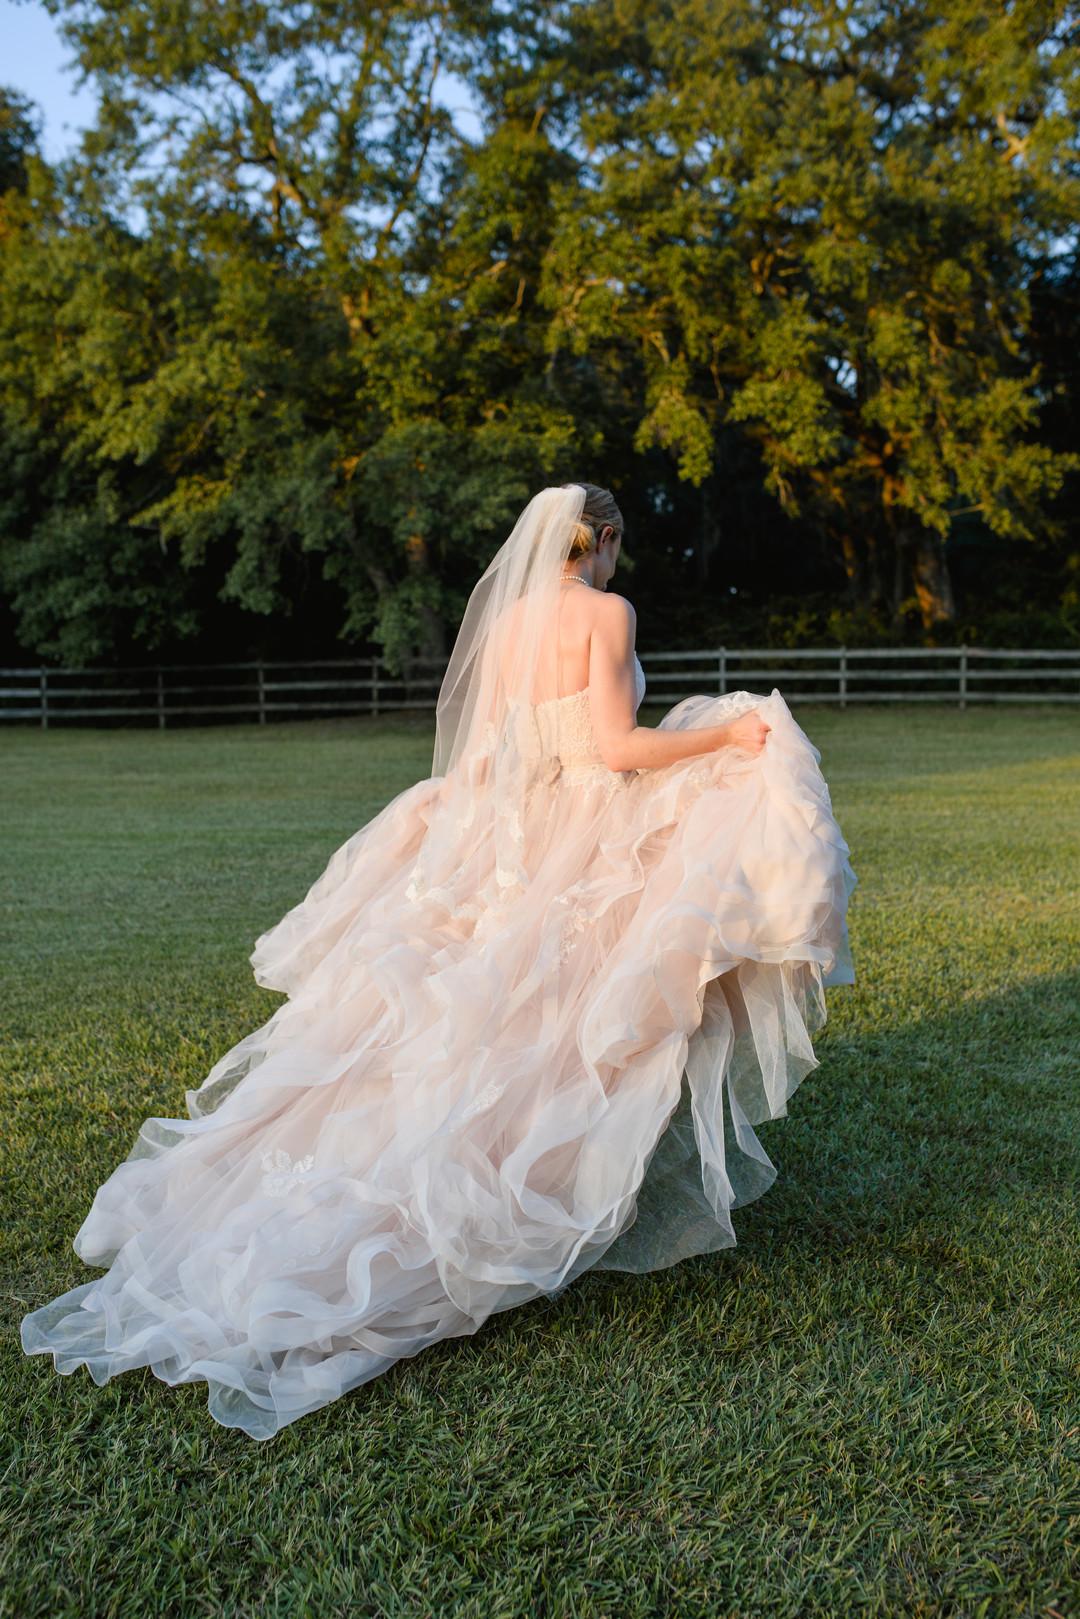 old-wide-awake-plantation-wedding-3.JPG